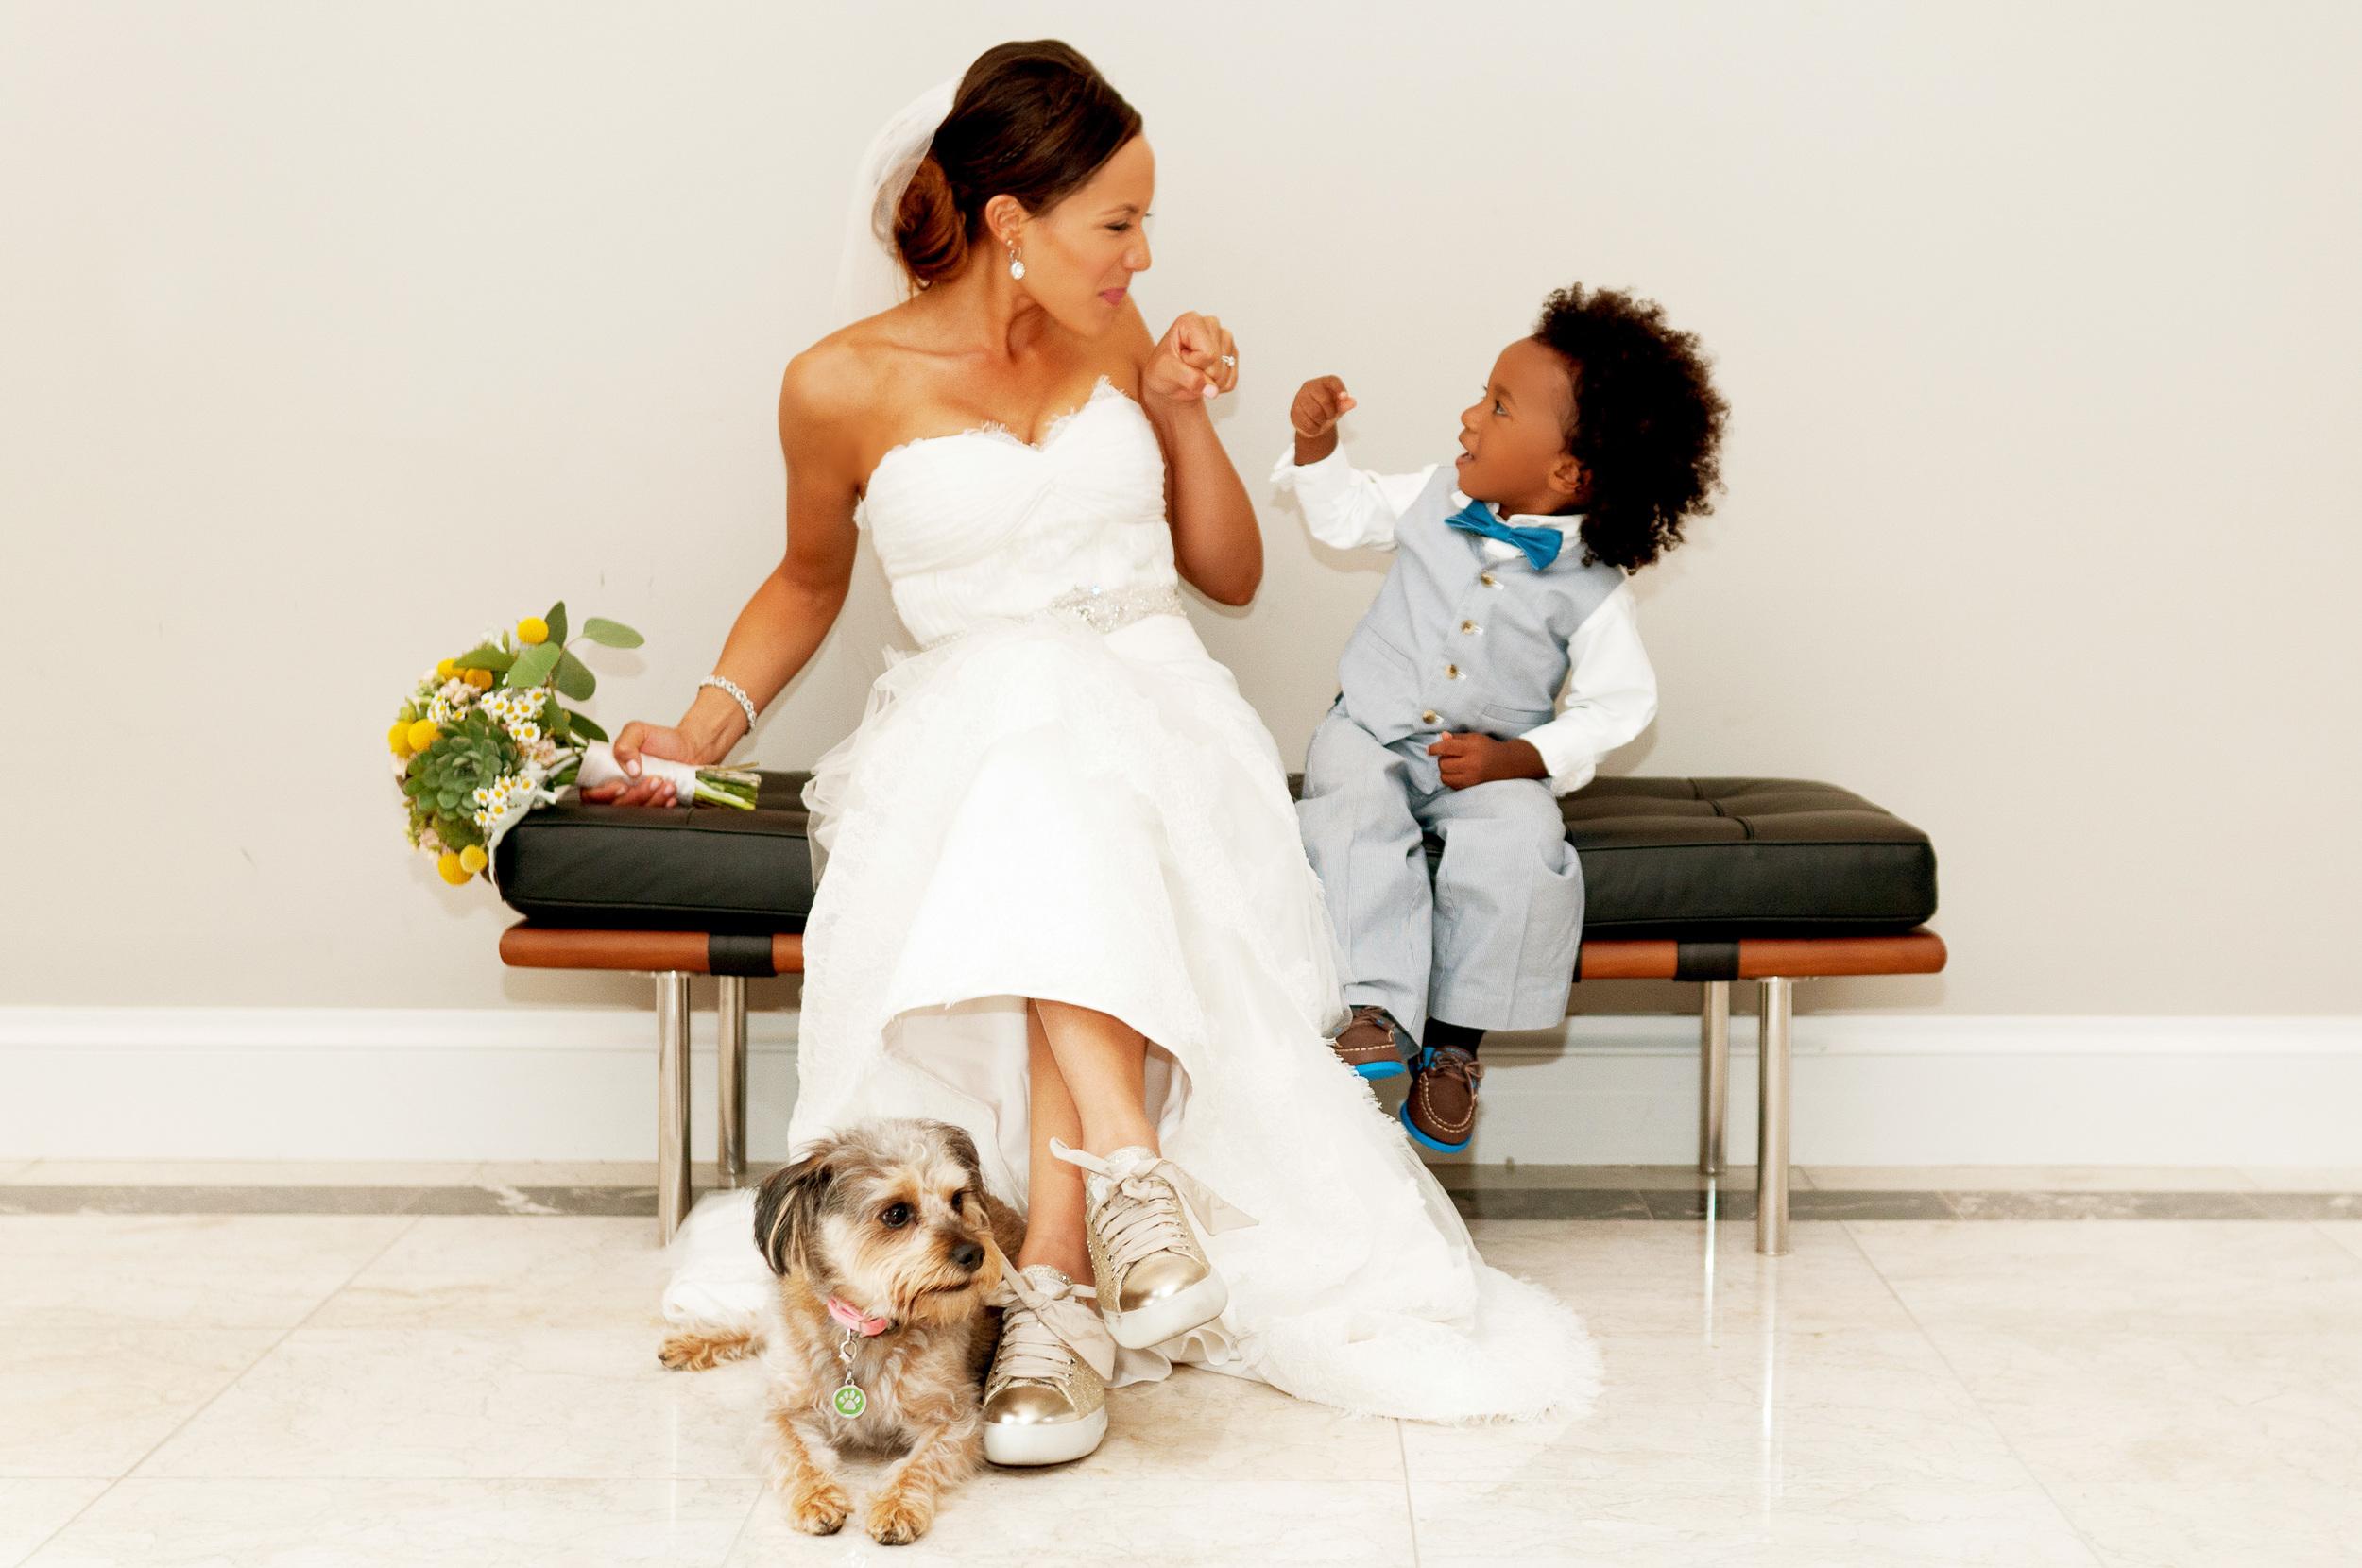 Cute bride and son photo